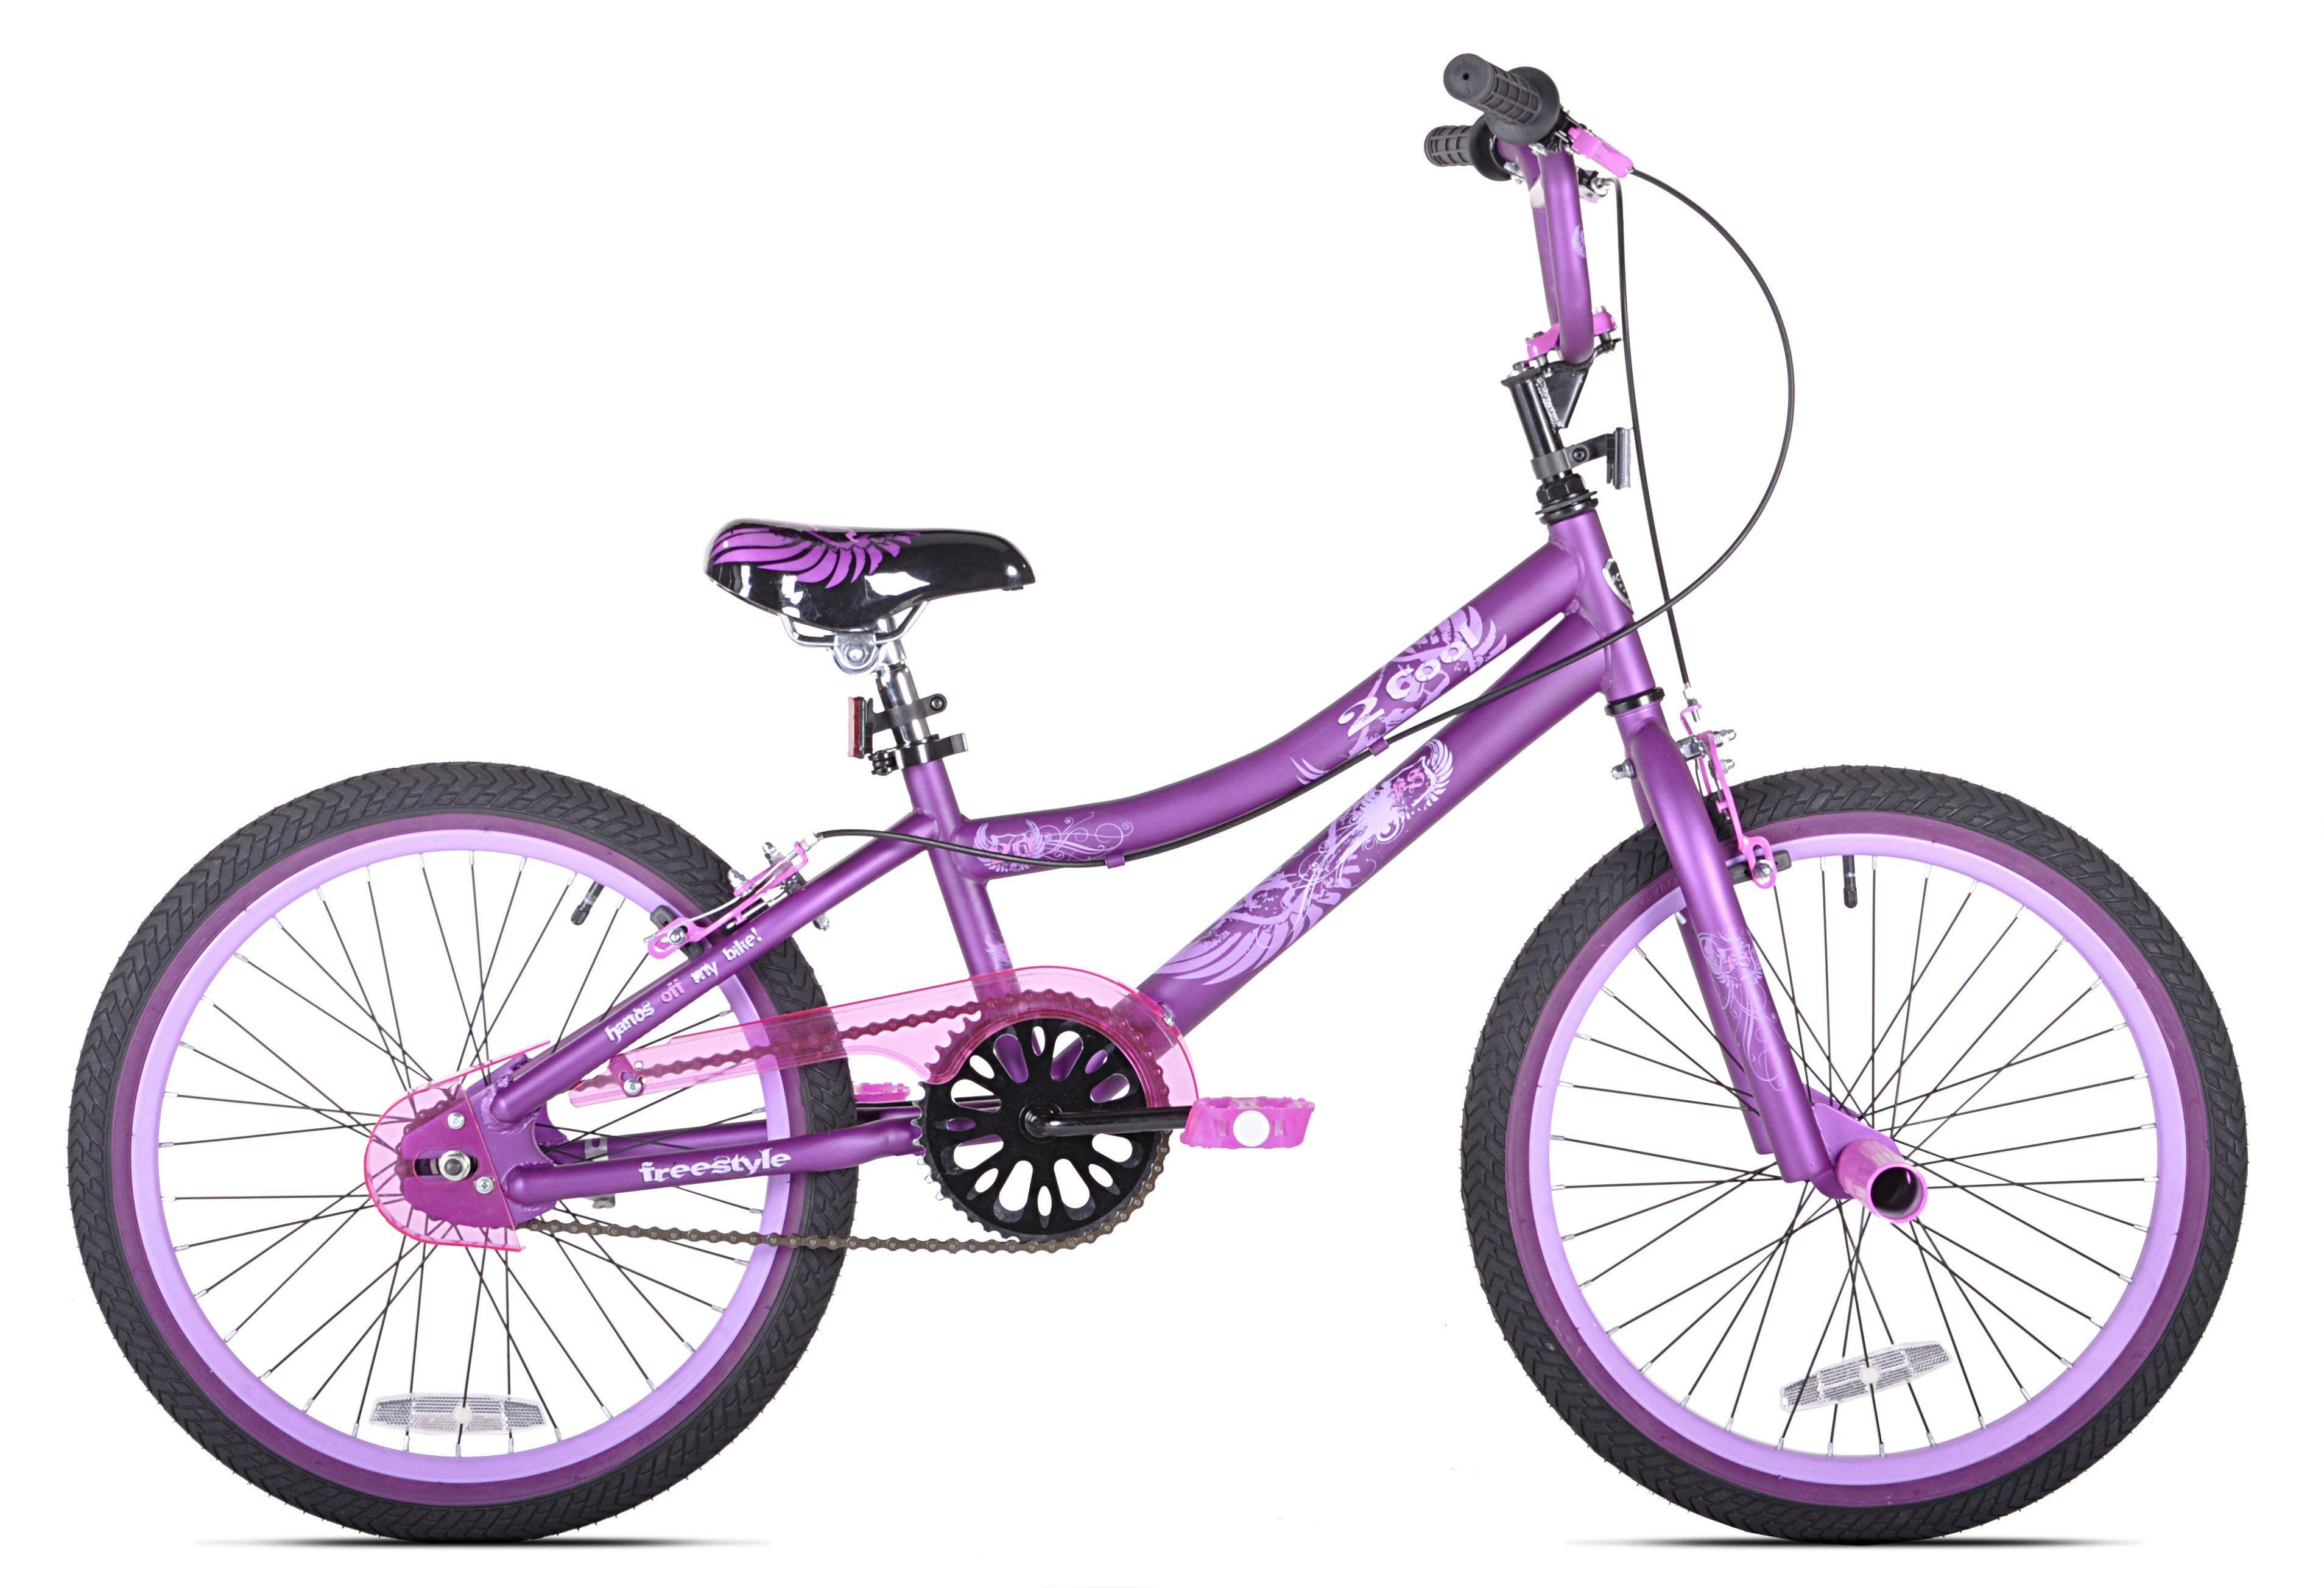 62098fde2a1c8 Kent 20 inch Girls Trouble Aqua black Bicycle